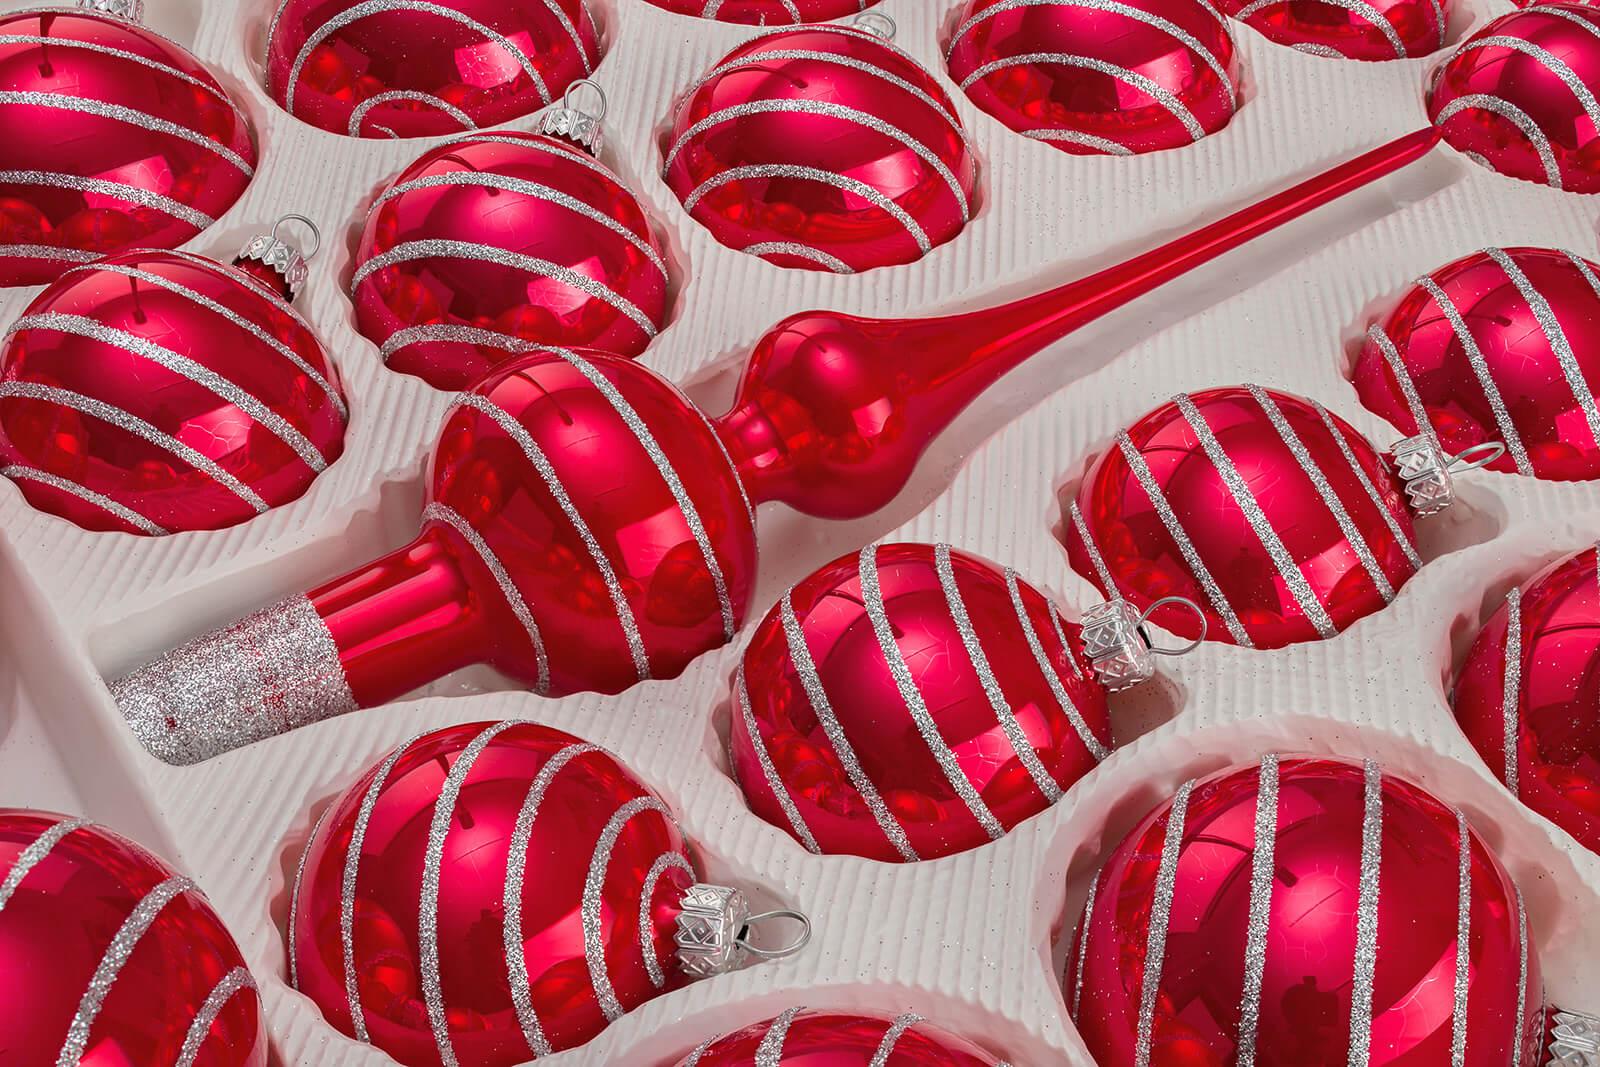 Christbaumkugeln Glas Rot Gold.Christbaumkugeln Glas Weihnachtskugeln Set In Rot